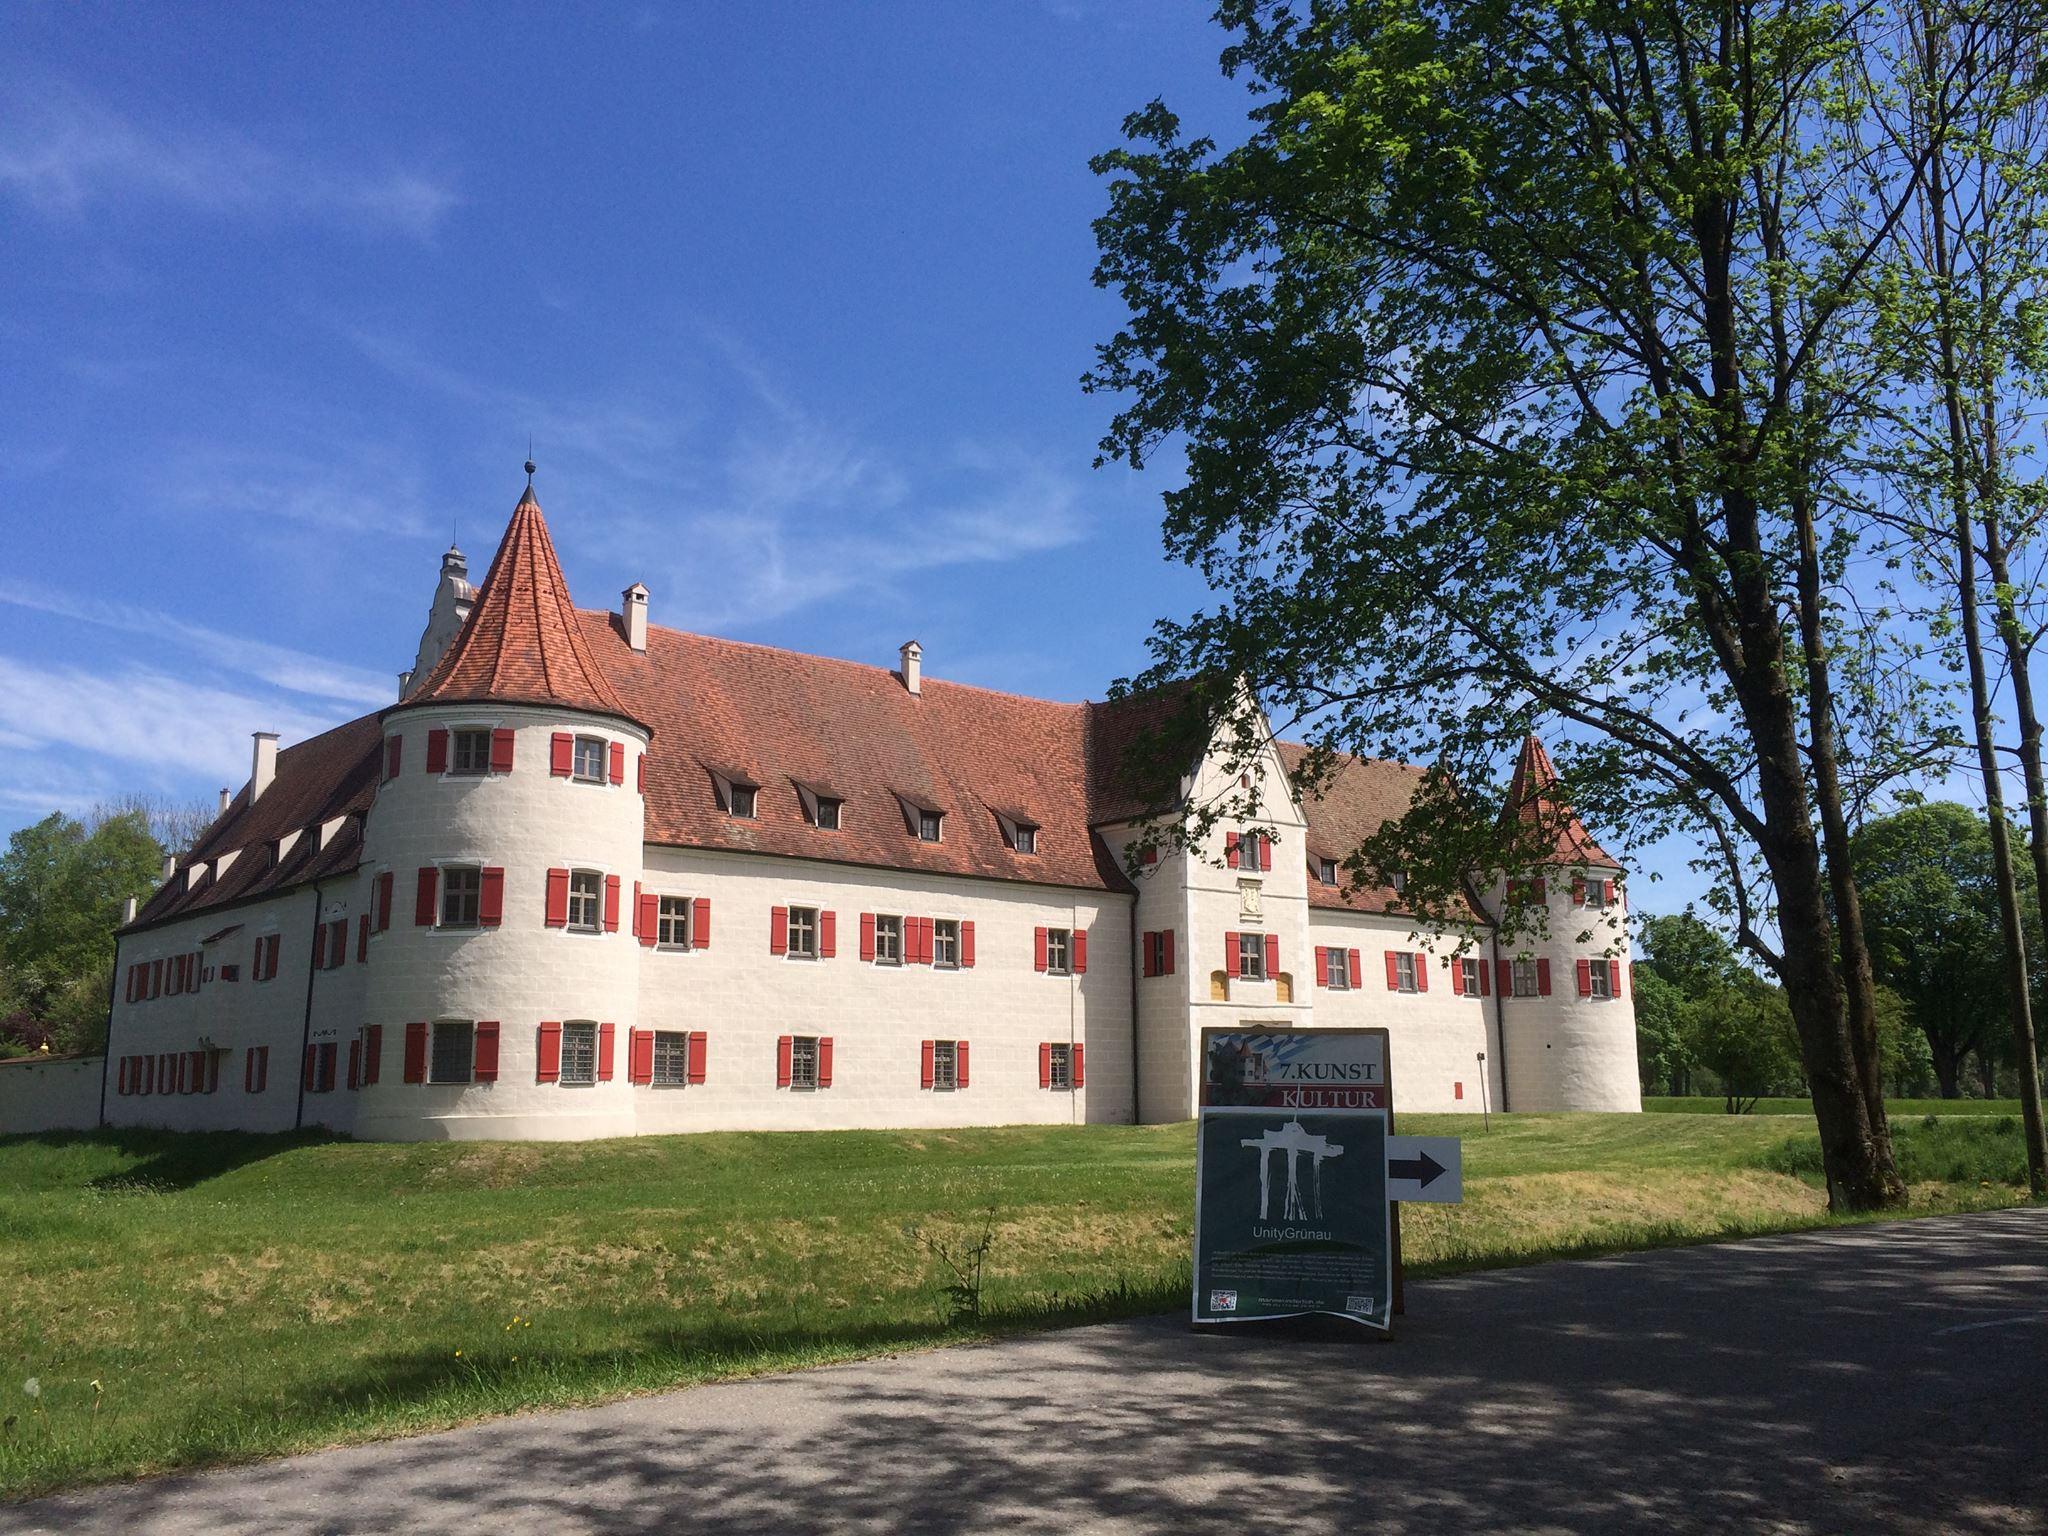 Ausstellung Schloss Grünau Neuburg a.d.D UnityGrünau